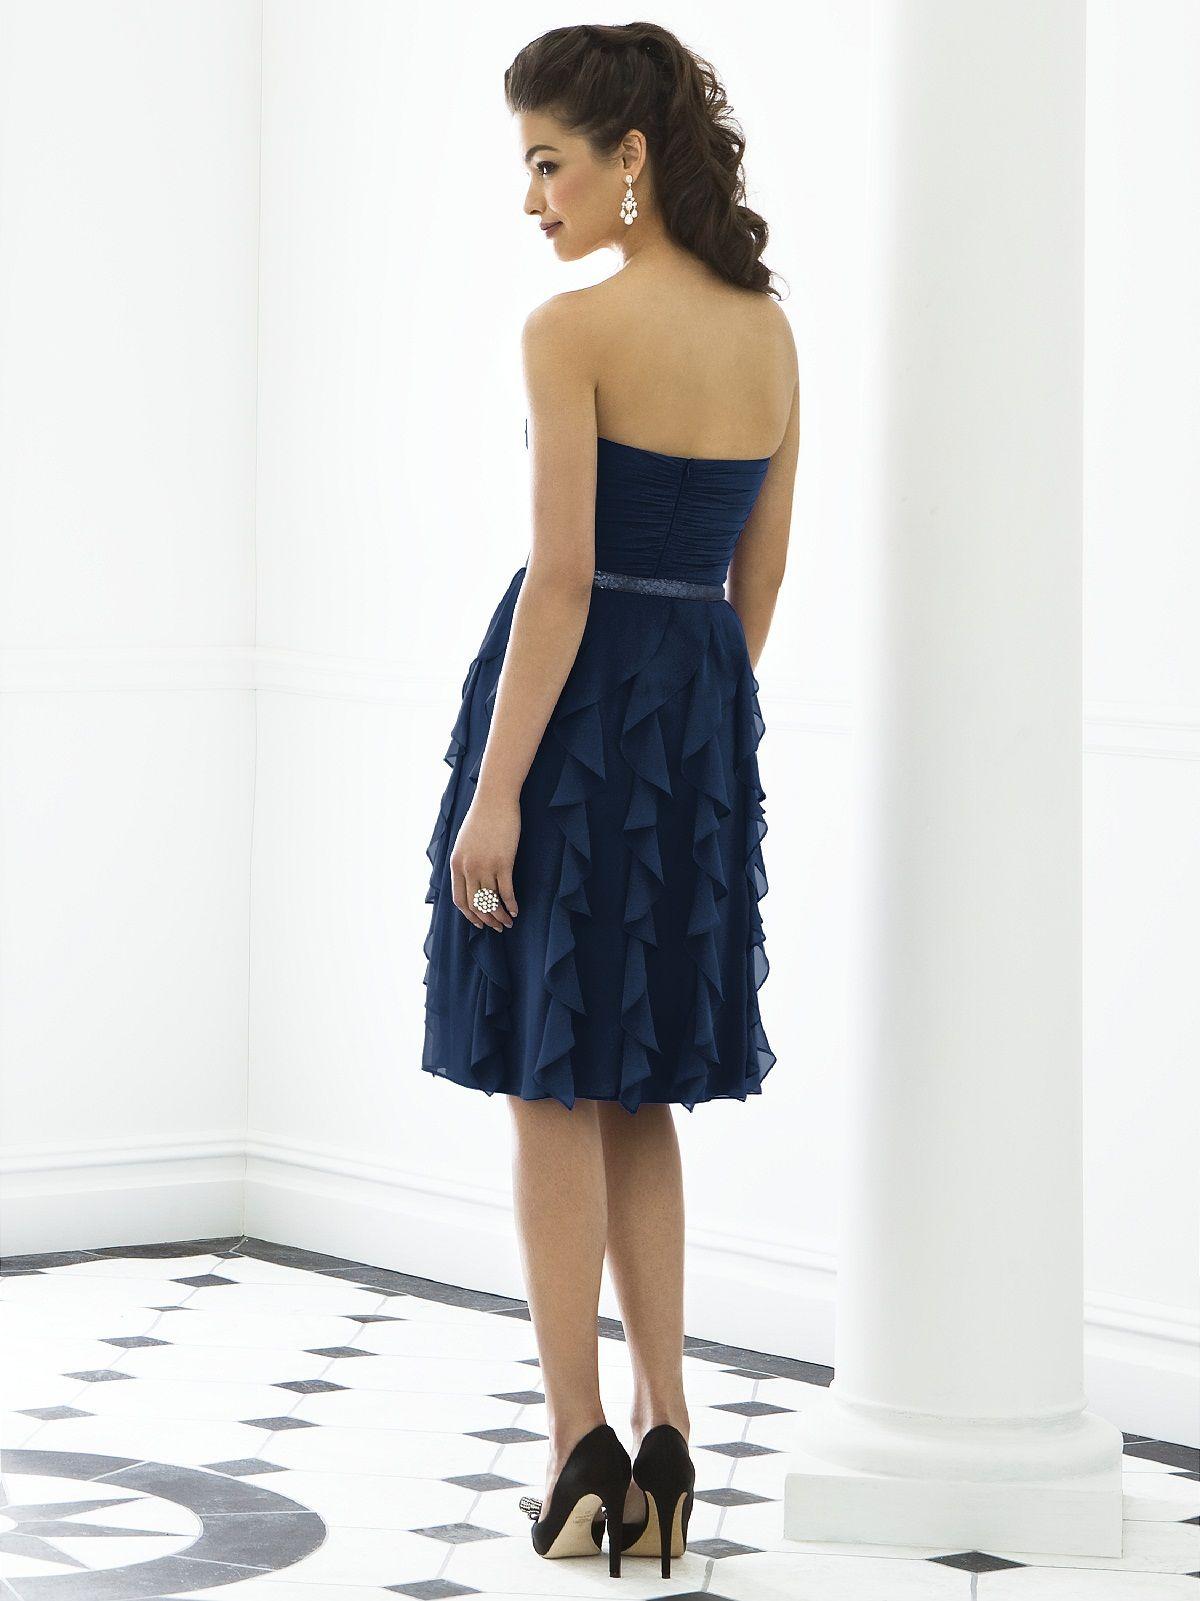 Moss After Six Bridesmaid Dress. dessy♥weddingchicks